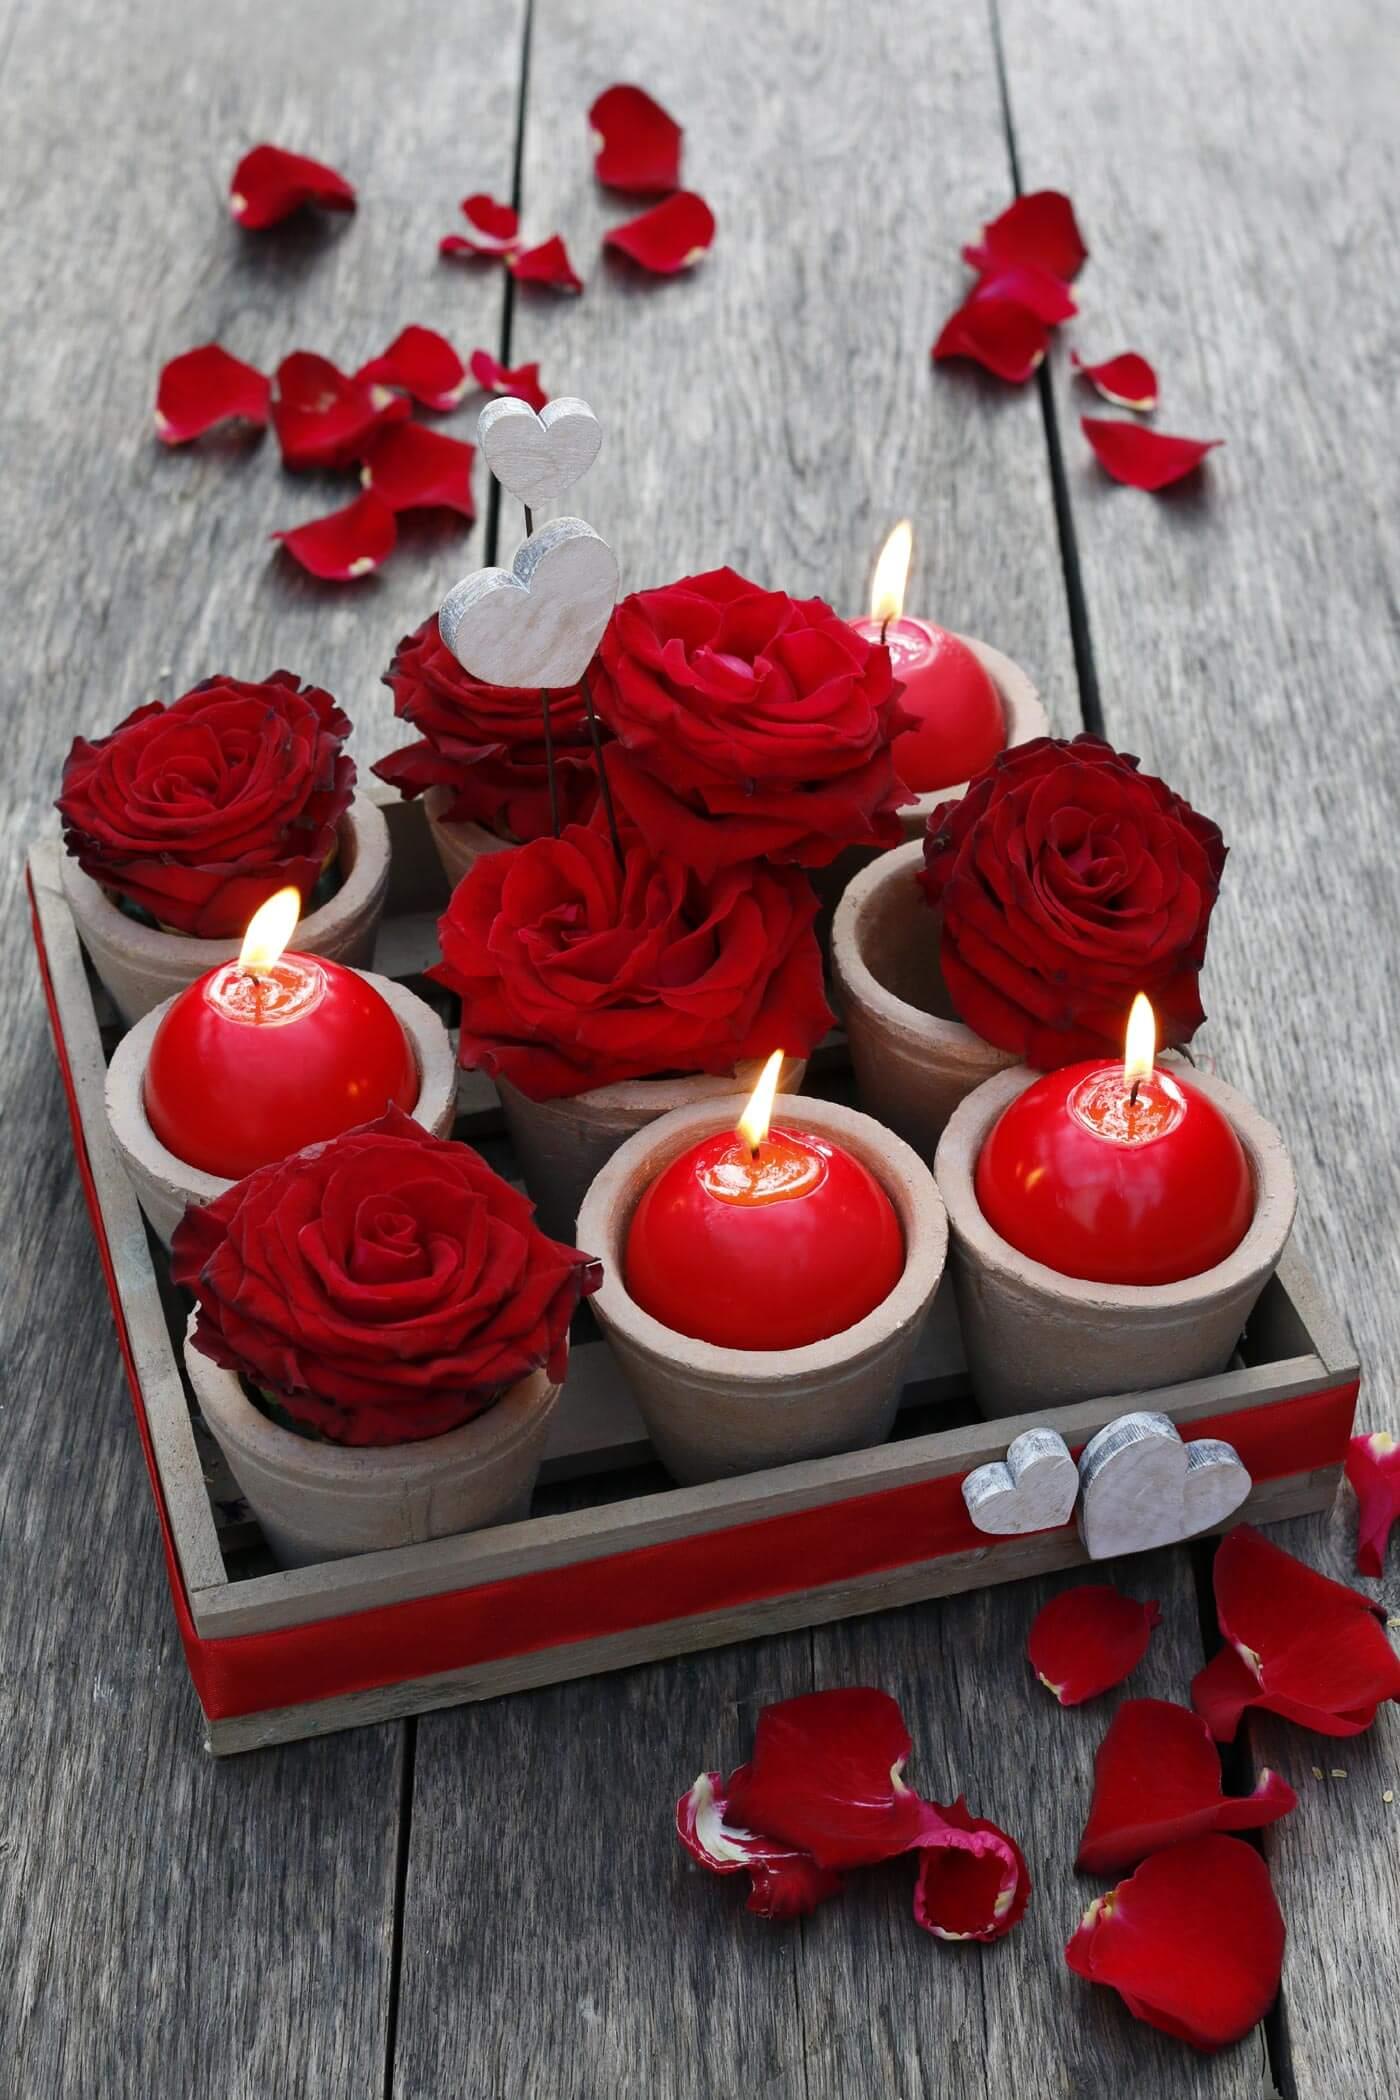 romantische tischdeko mit rosen diy anleitung. Black Bedroom Furniture Sets. Home Design Ideas